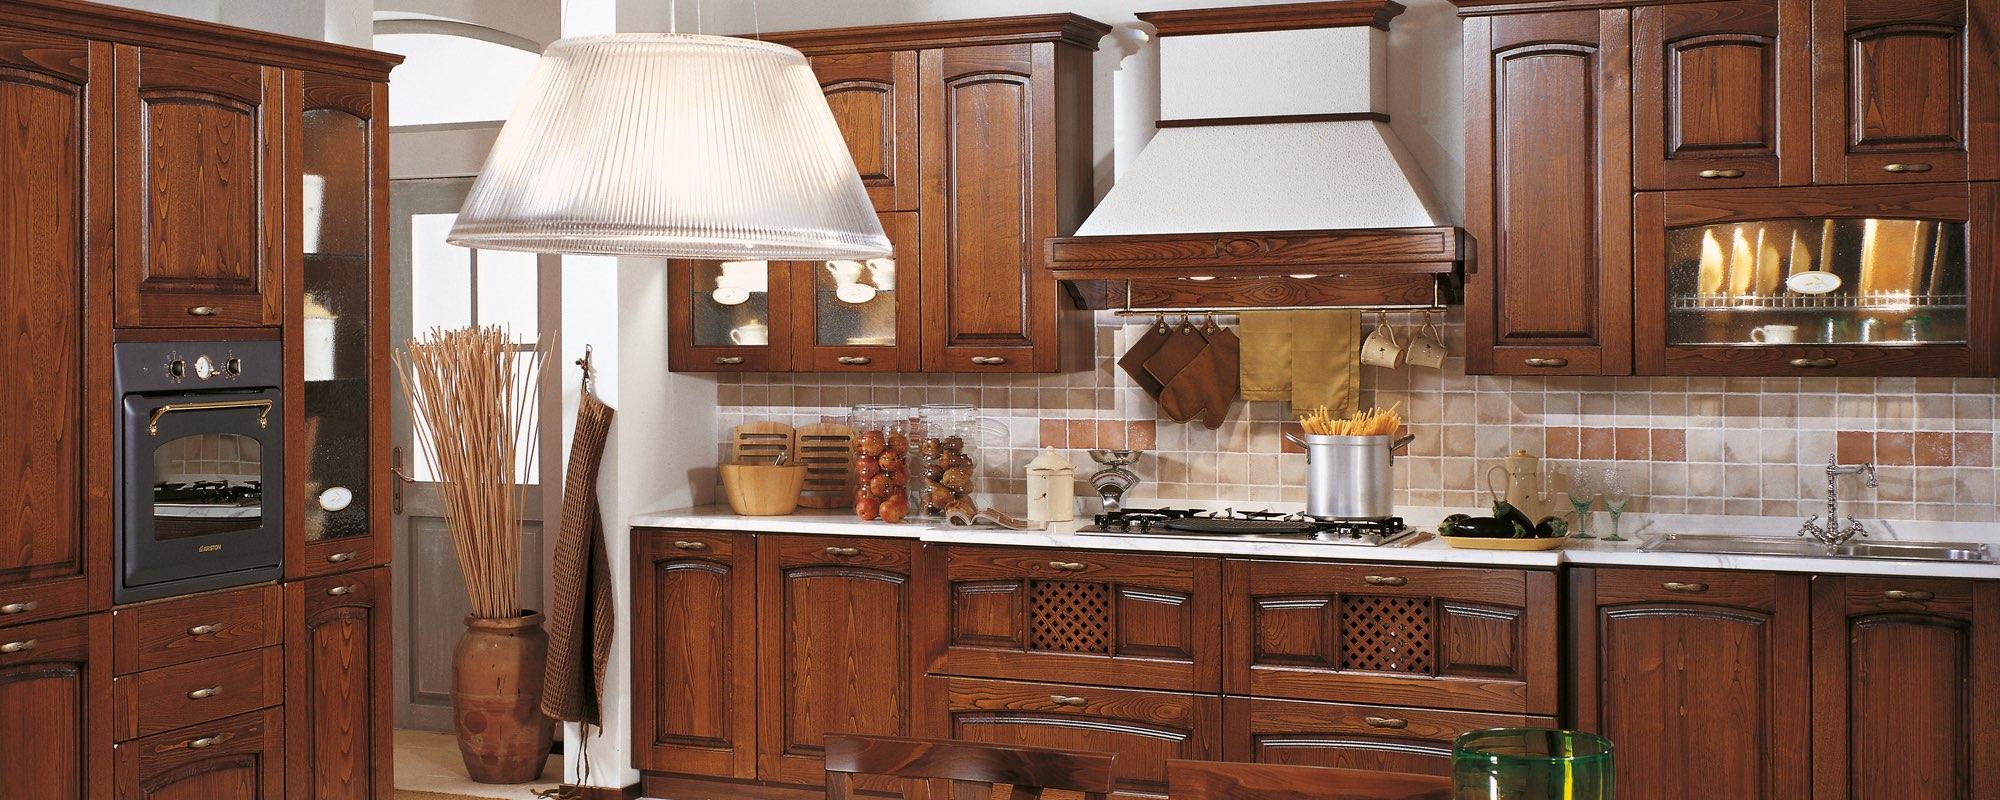 cucina classica in legno -FOCOLARE